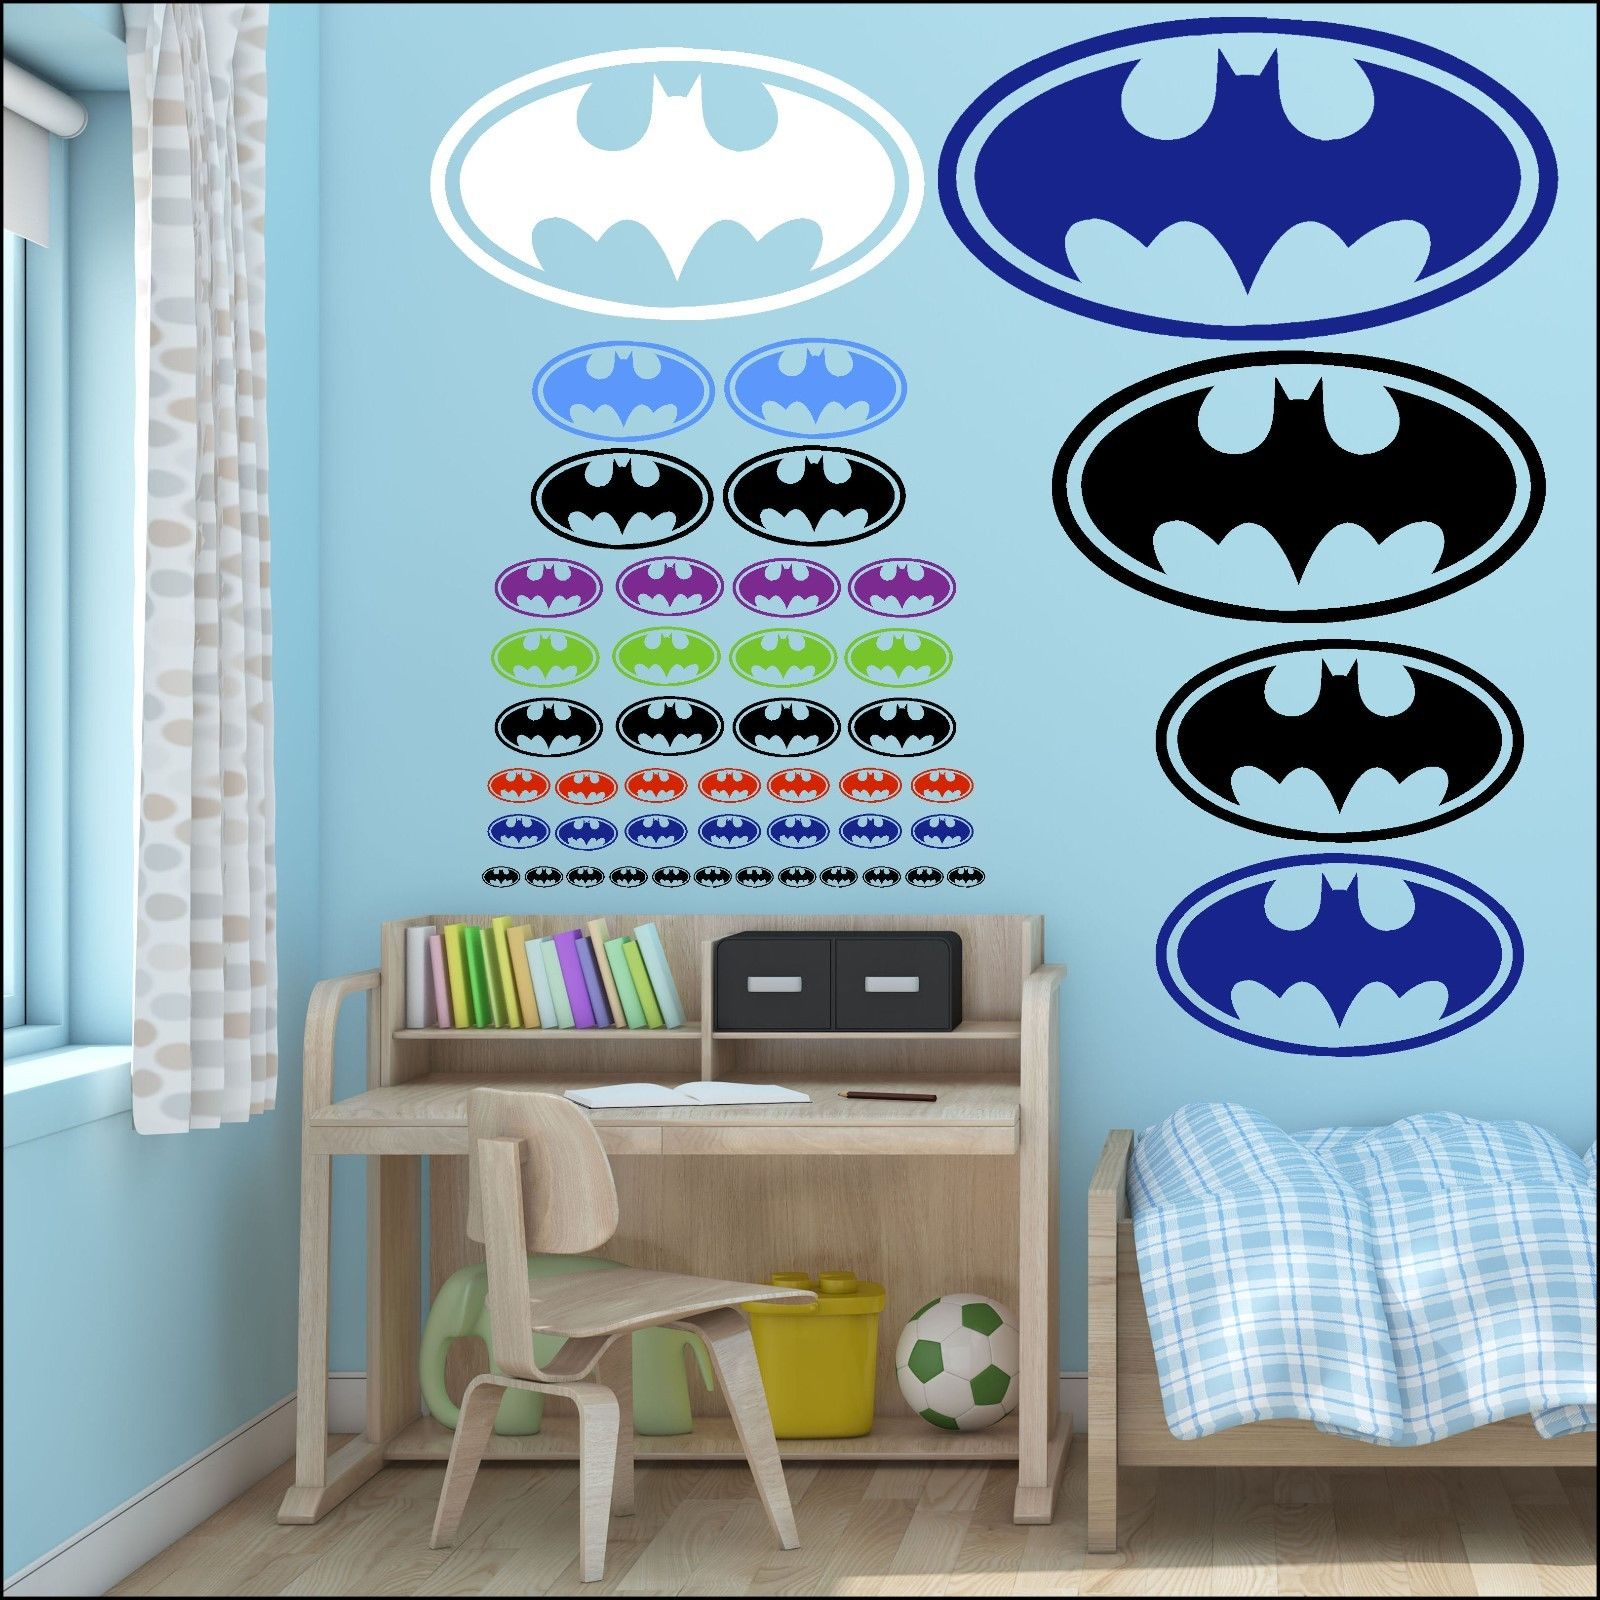 SMALL BATMAN BAT MAN LOGO CHILDRENS WALL ART STICKERS TRANSFER STENCIL DECAL